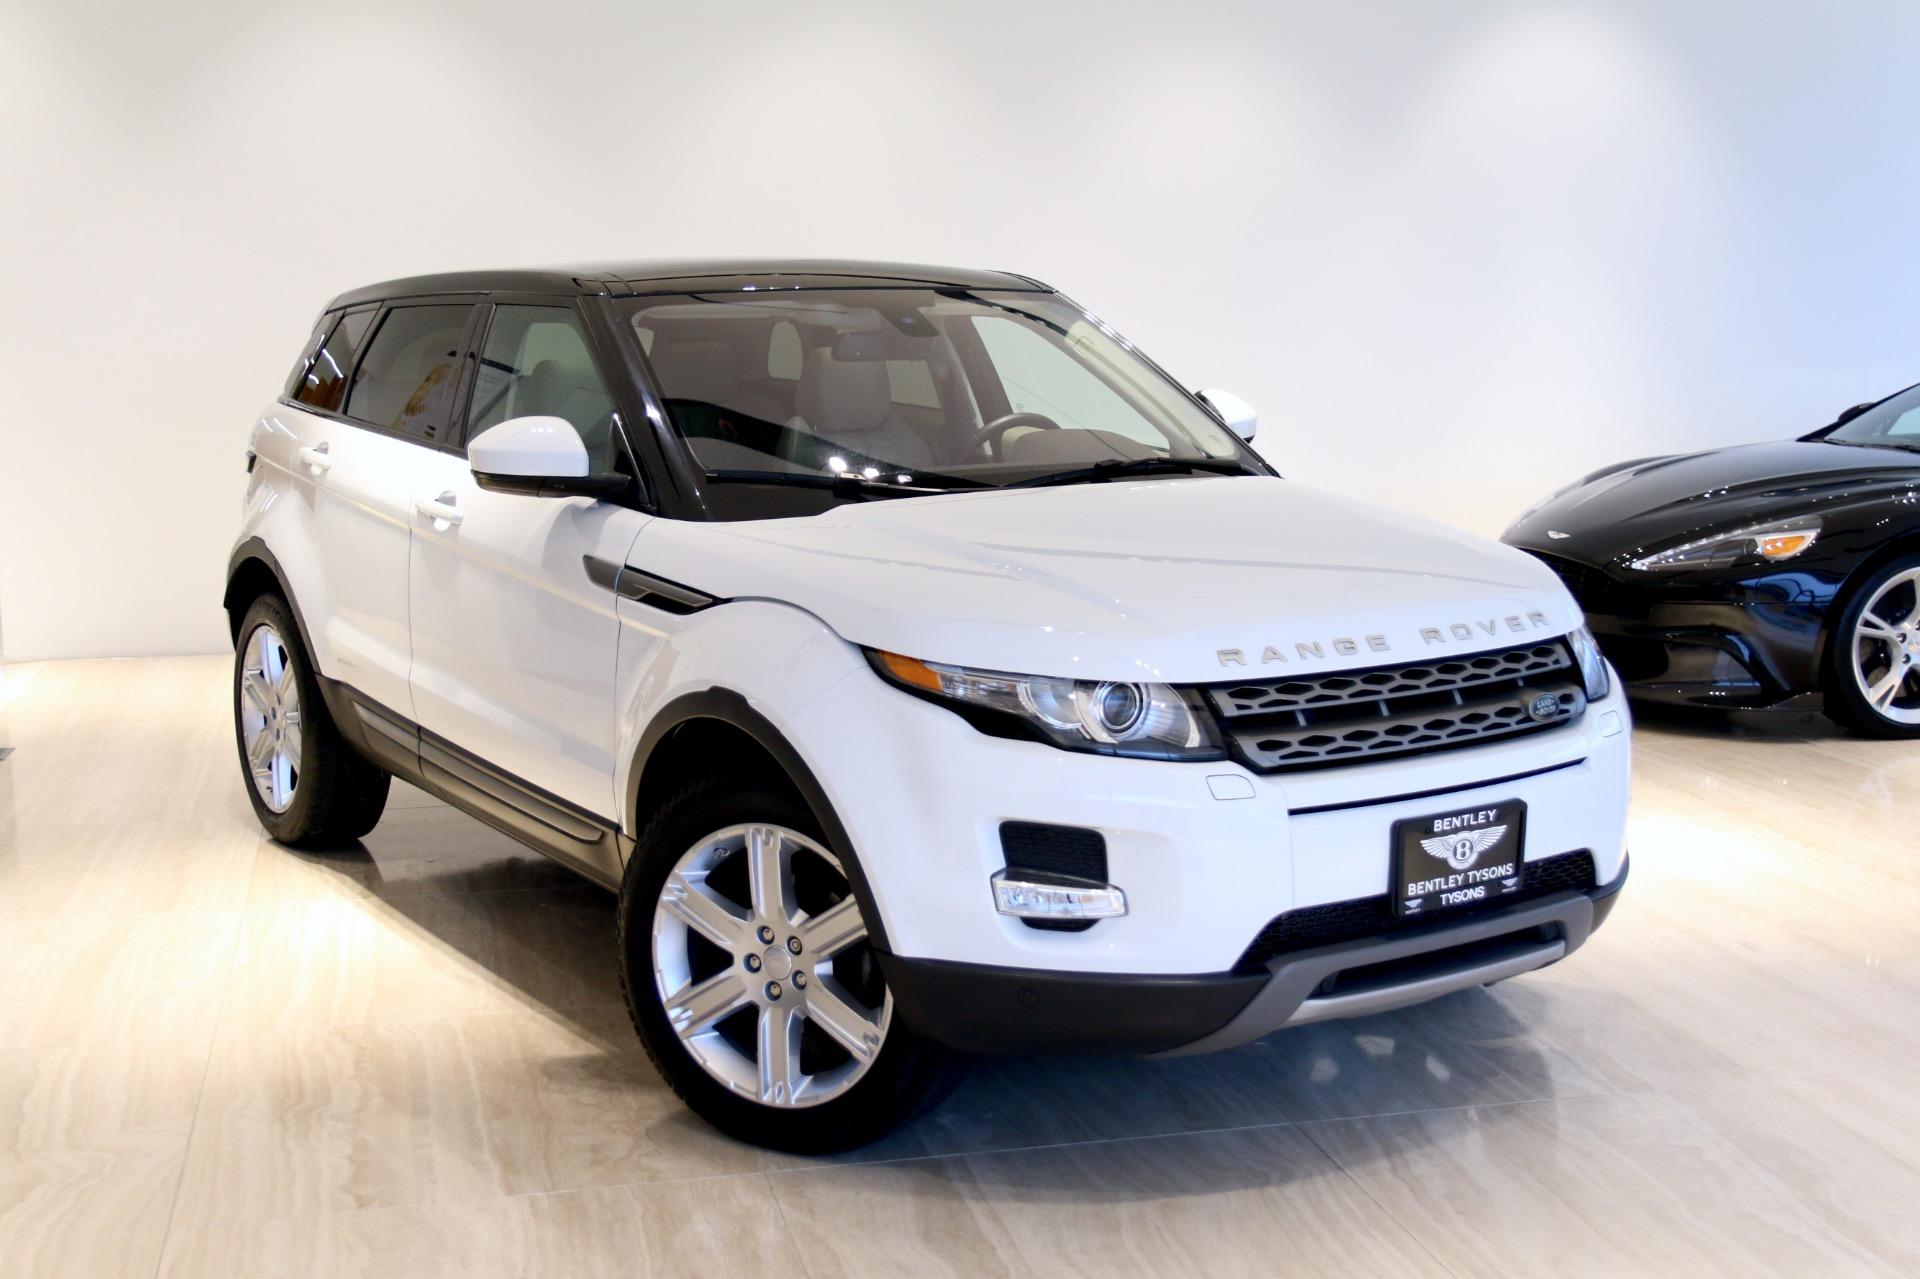 2015 Land Rover Range Rover Evoque Pure Plus Stock P052706 For Sale Near Vienna Va Va Land Rover Dealer For Sale In Vienna Va P052706 Exclusive Automotive Group